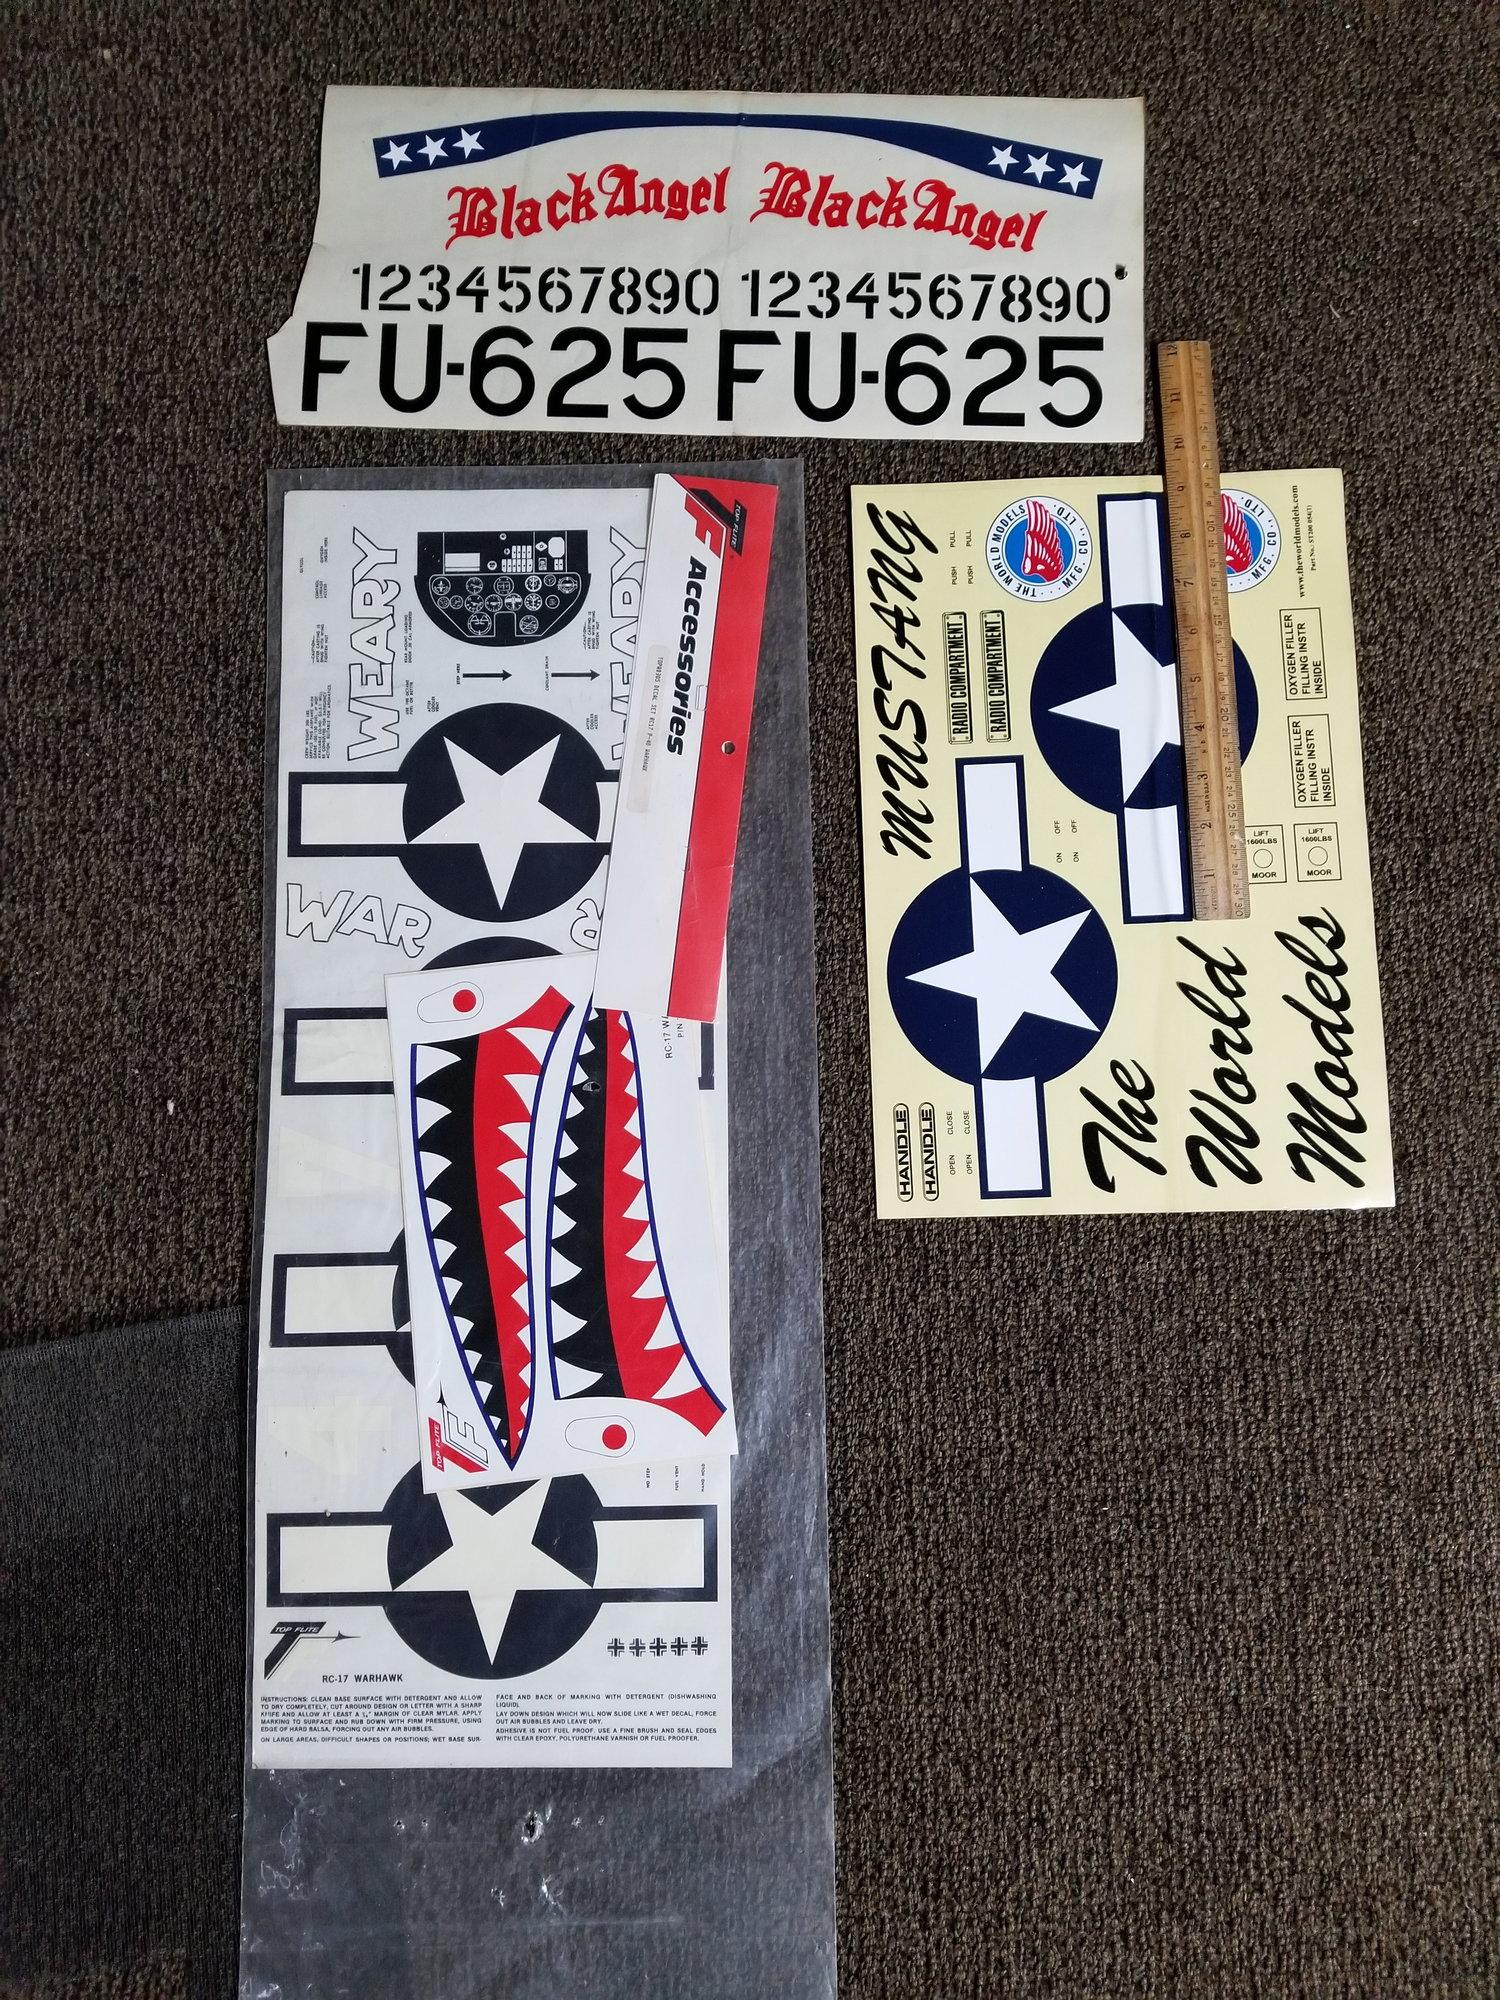 P40 Flying Tiger decals - RCU Forums